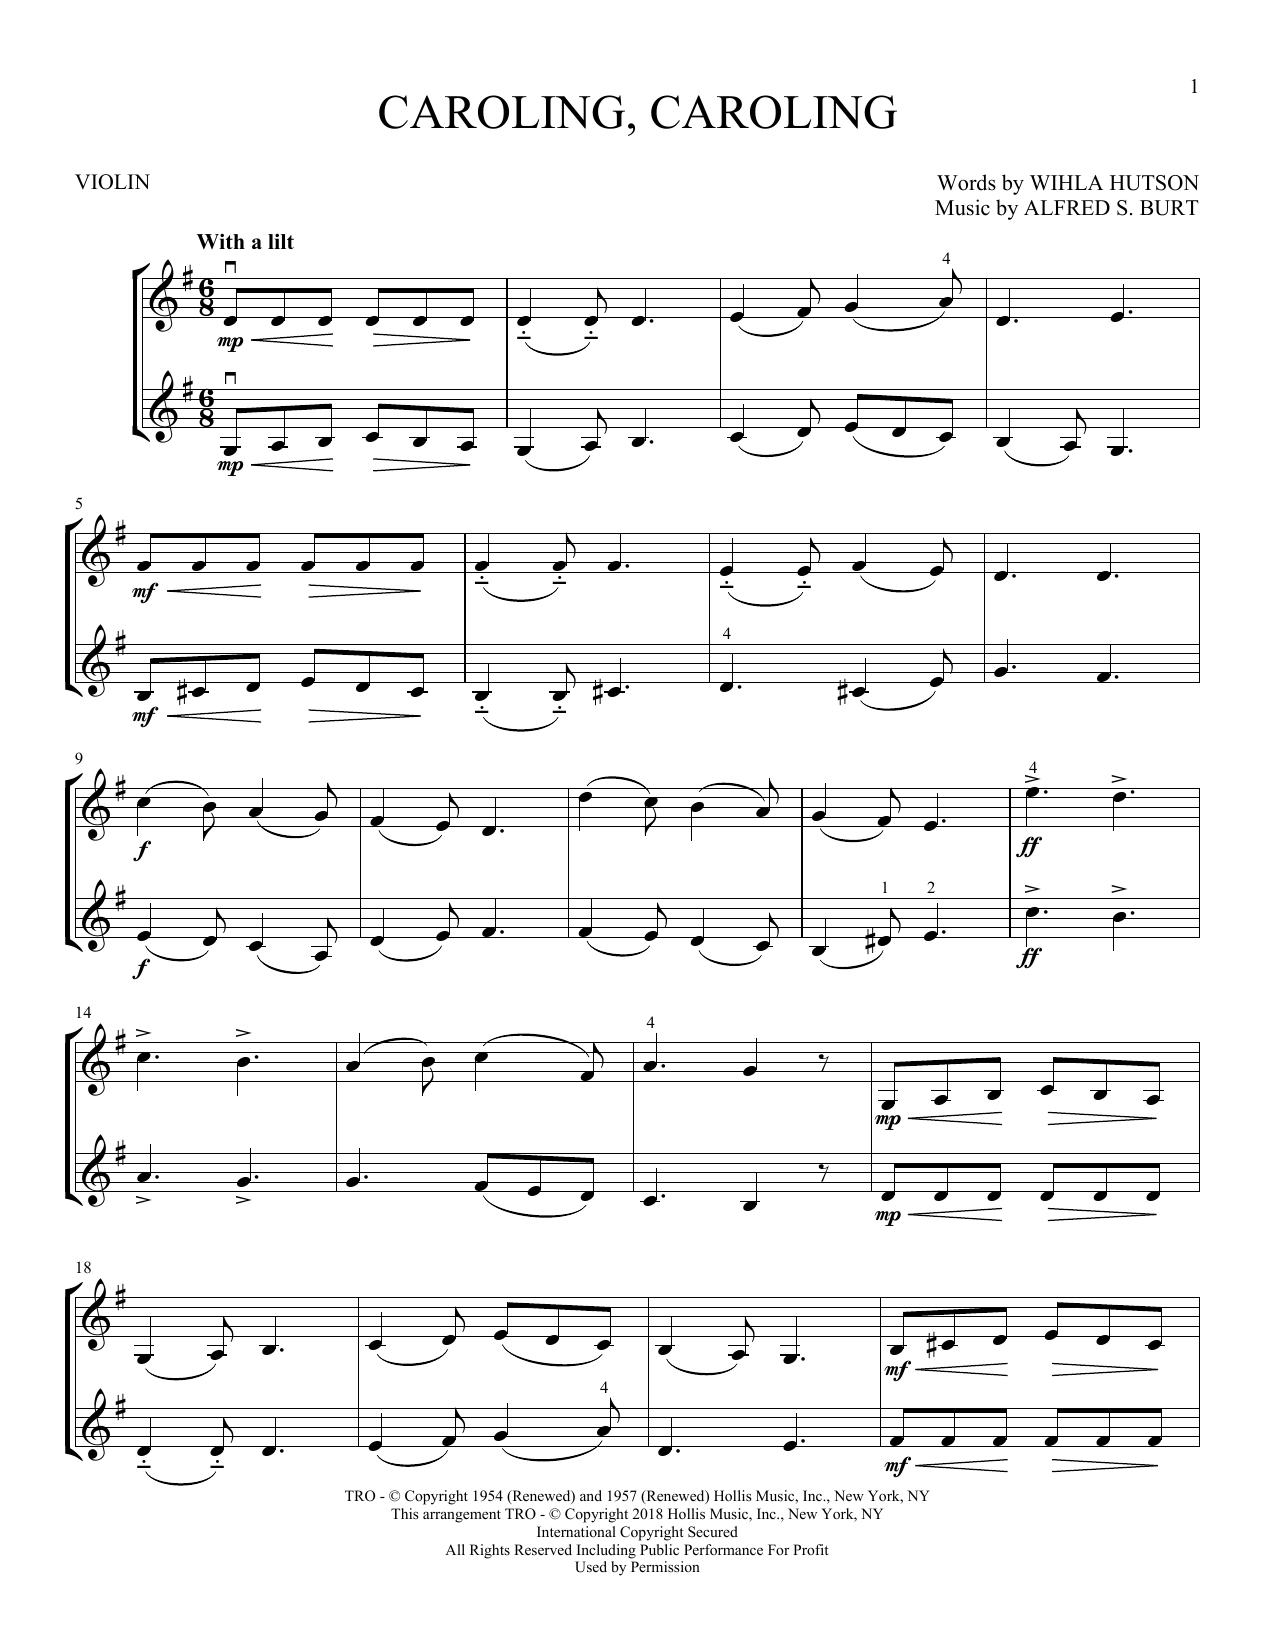 Caroling, Caroling (Violin Duet)